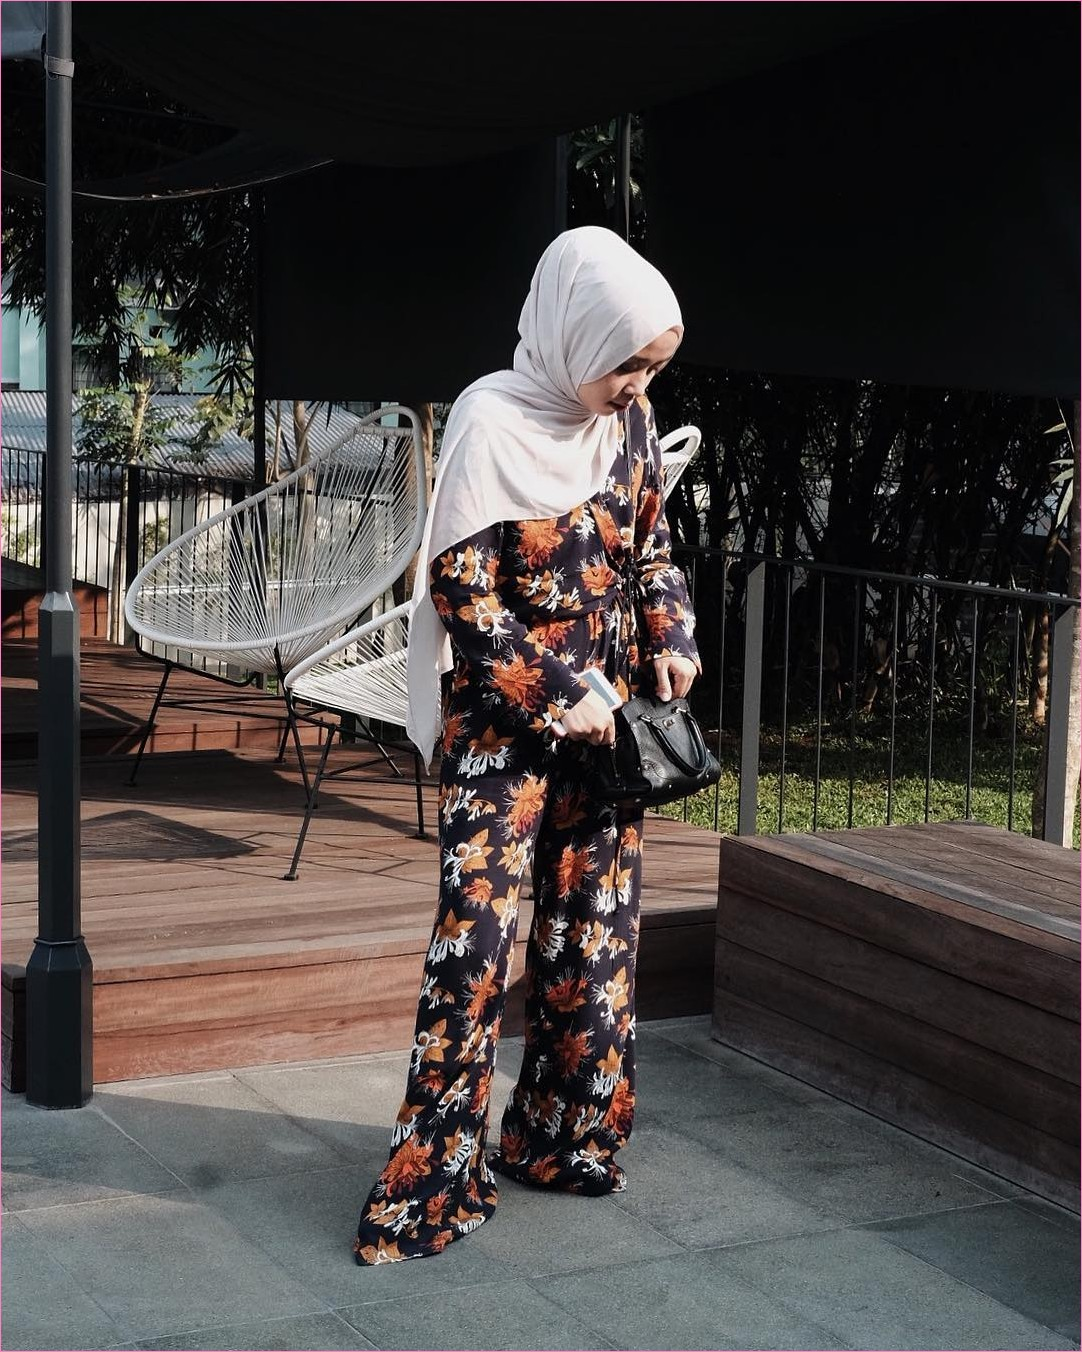 Outfit Baju Hijab Casual Untuk Ke Kantor Ala Selebgam 2018 sling bags hitam jumpsuit bermotif daun hitam oren pashmina polos putih krem muda ciput rajut handphone high heels wedges gaya casual kain katun rayon sutra ootd outfit ootd 2018 selebgram kursi kayu pohon hijau pager abu tua